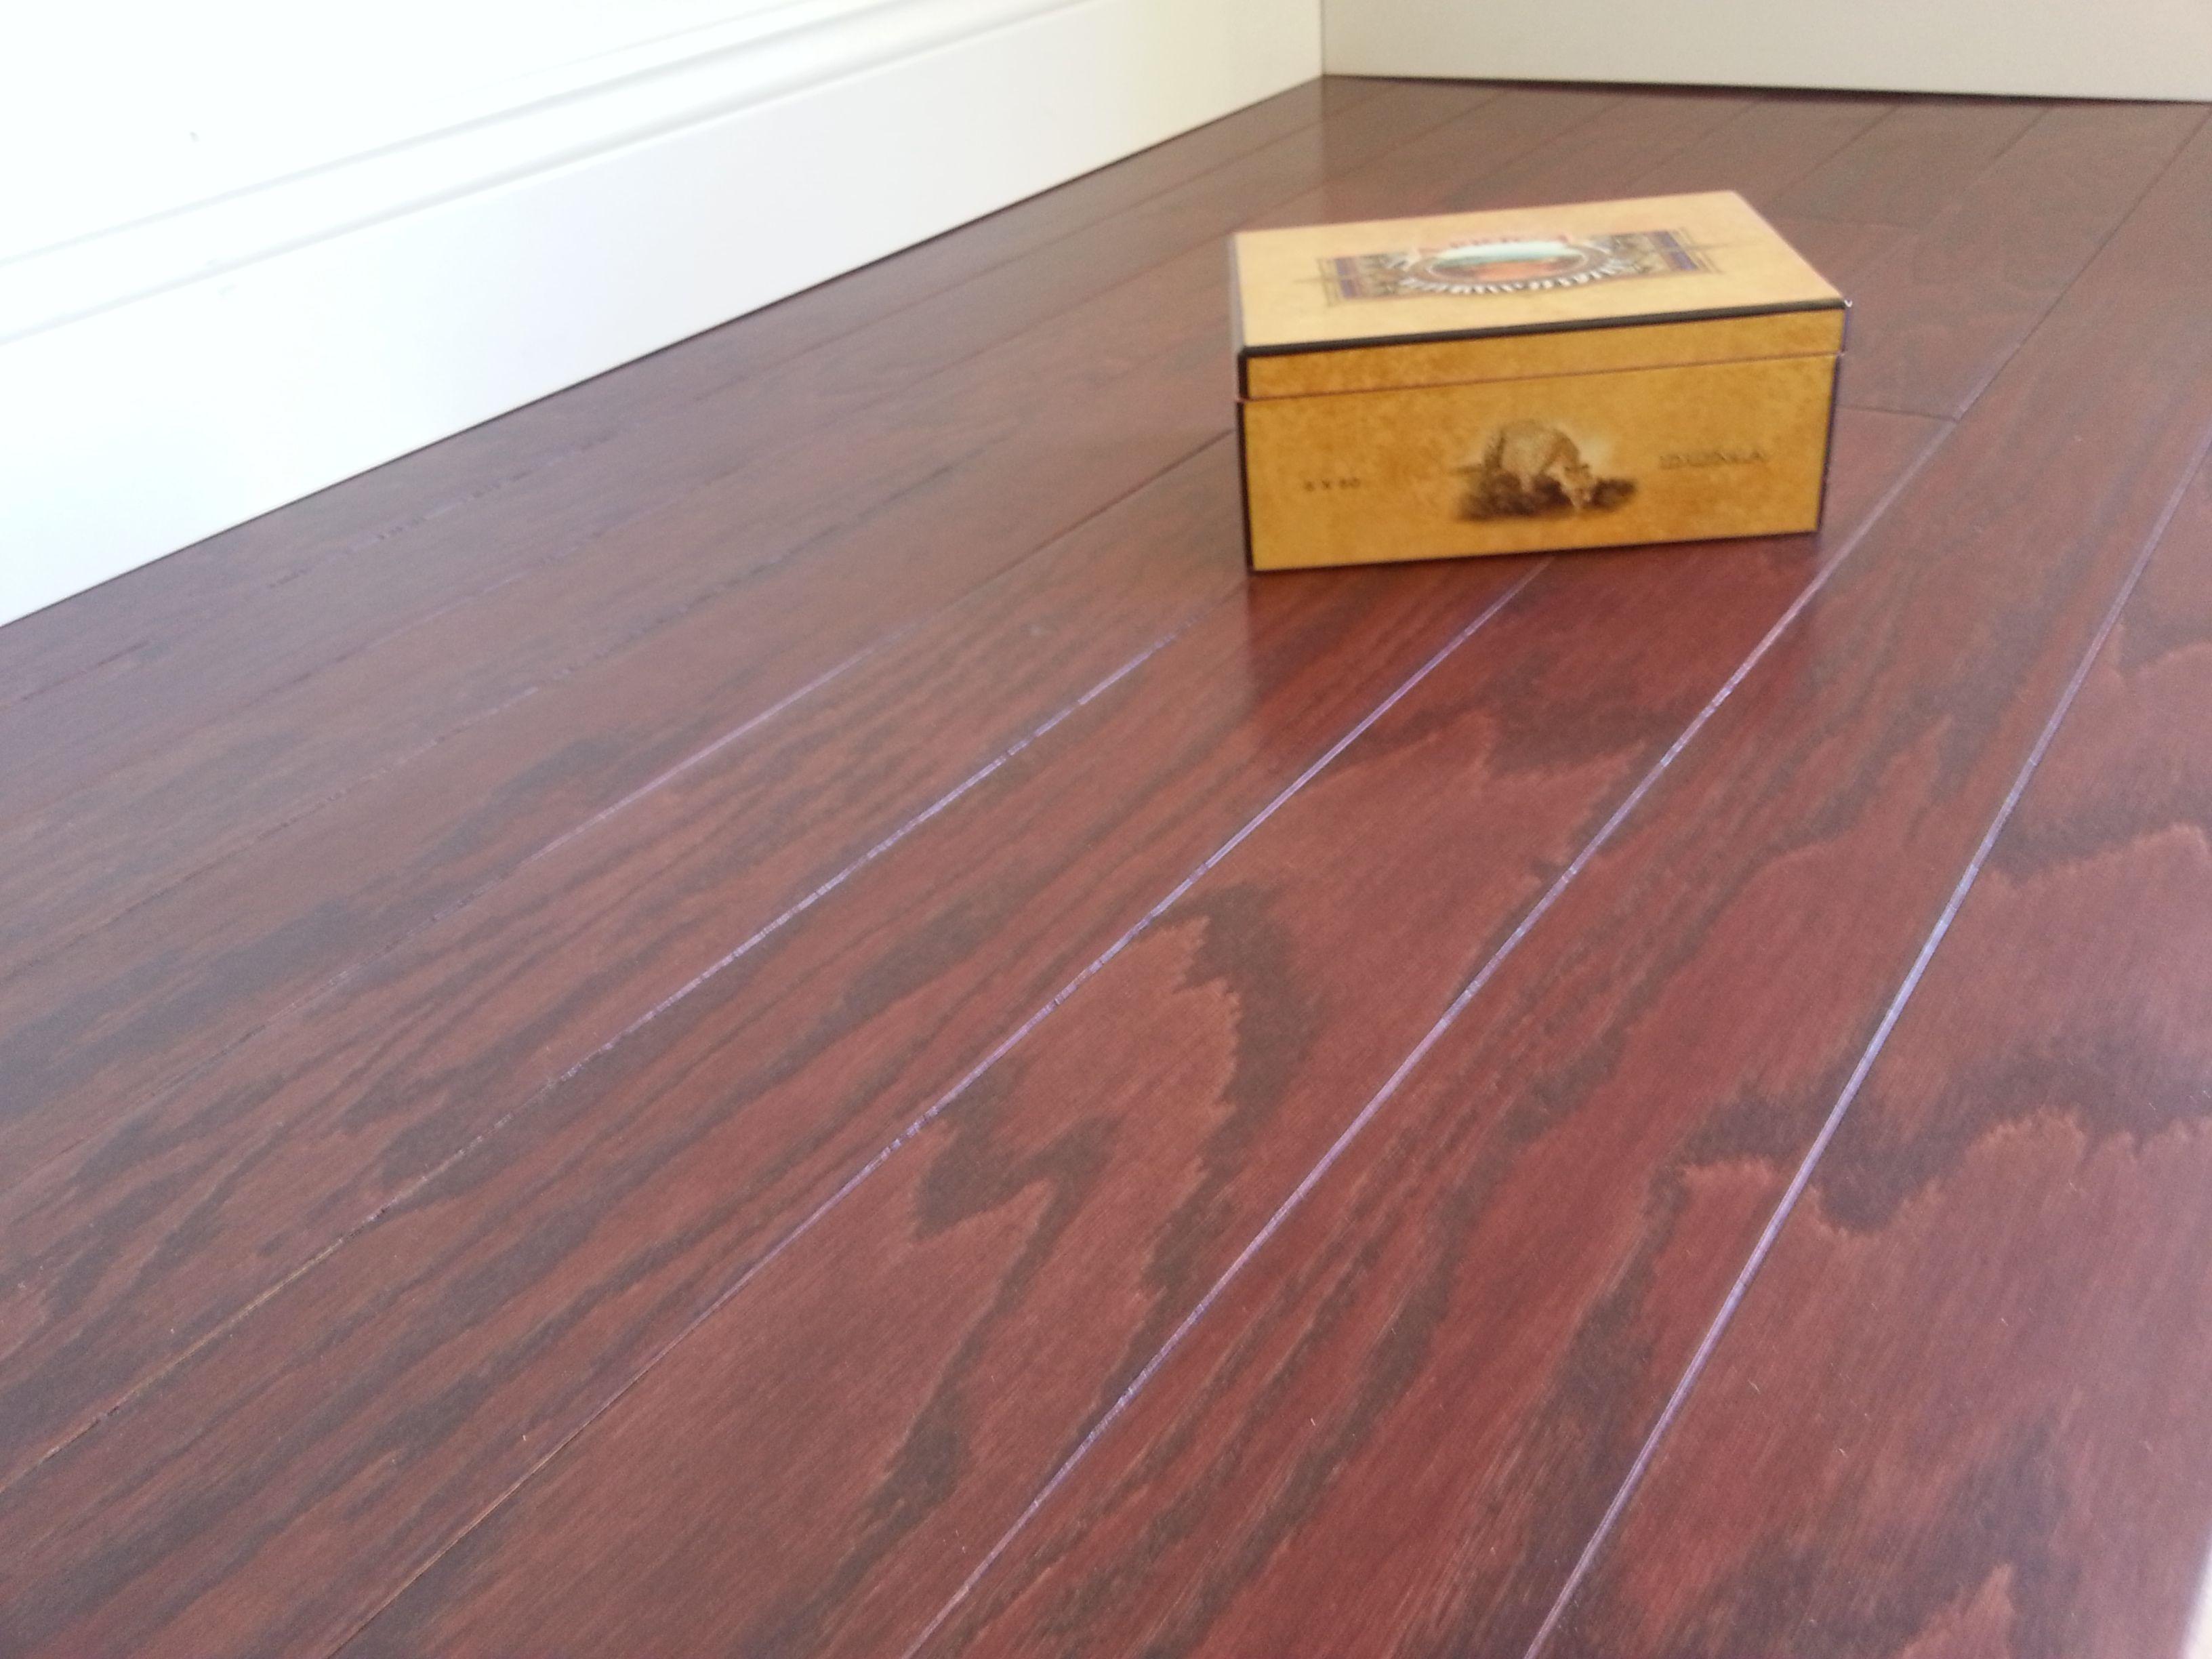 engineered hardwood flooring for basement of 3 1 4 symphonic engineered oak merlot hardwood flooring as low as with 3 1 4 symphonic engineered oak merlot hardwood flooring as low as 3 23 sf